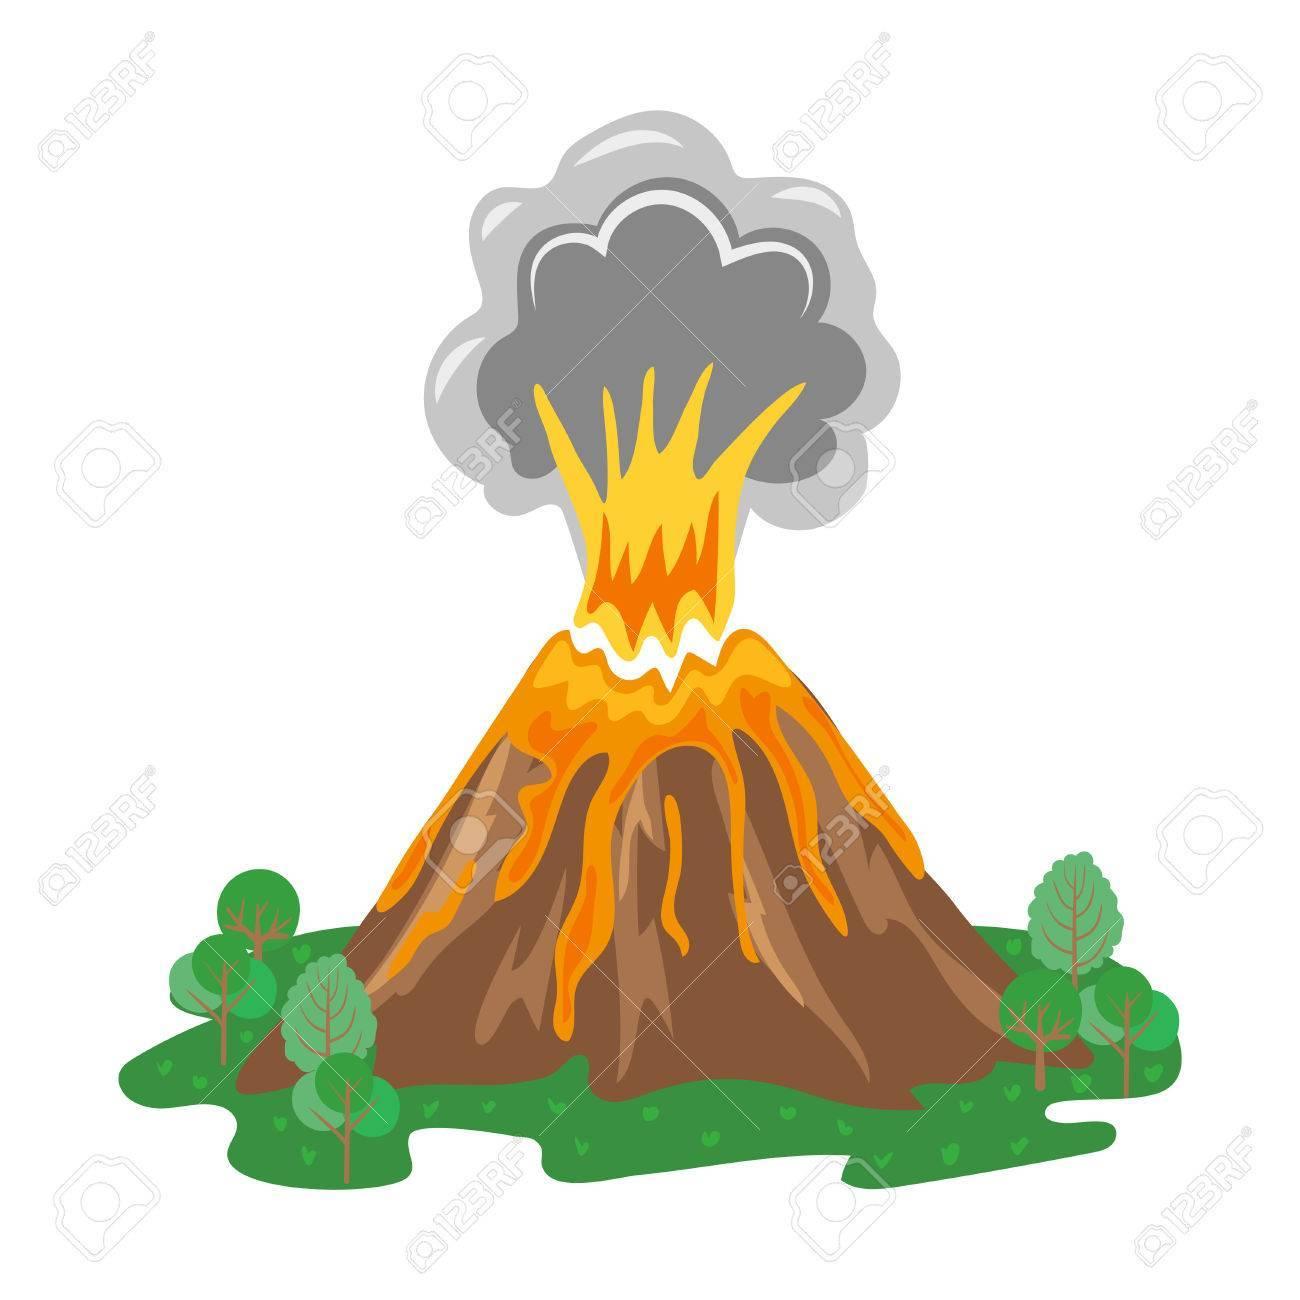 Valcaino clipart clip art royalty free download Erupting volcano clipart 6 » Clipart Portal clip art royalty free download